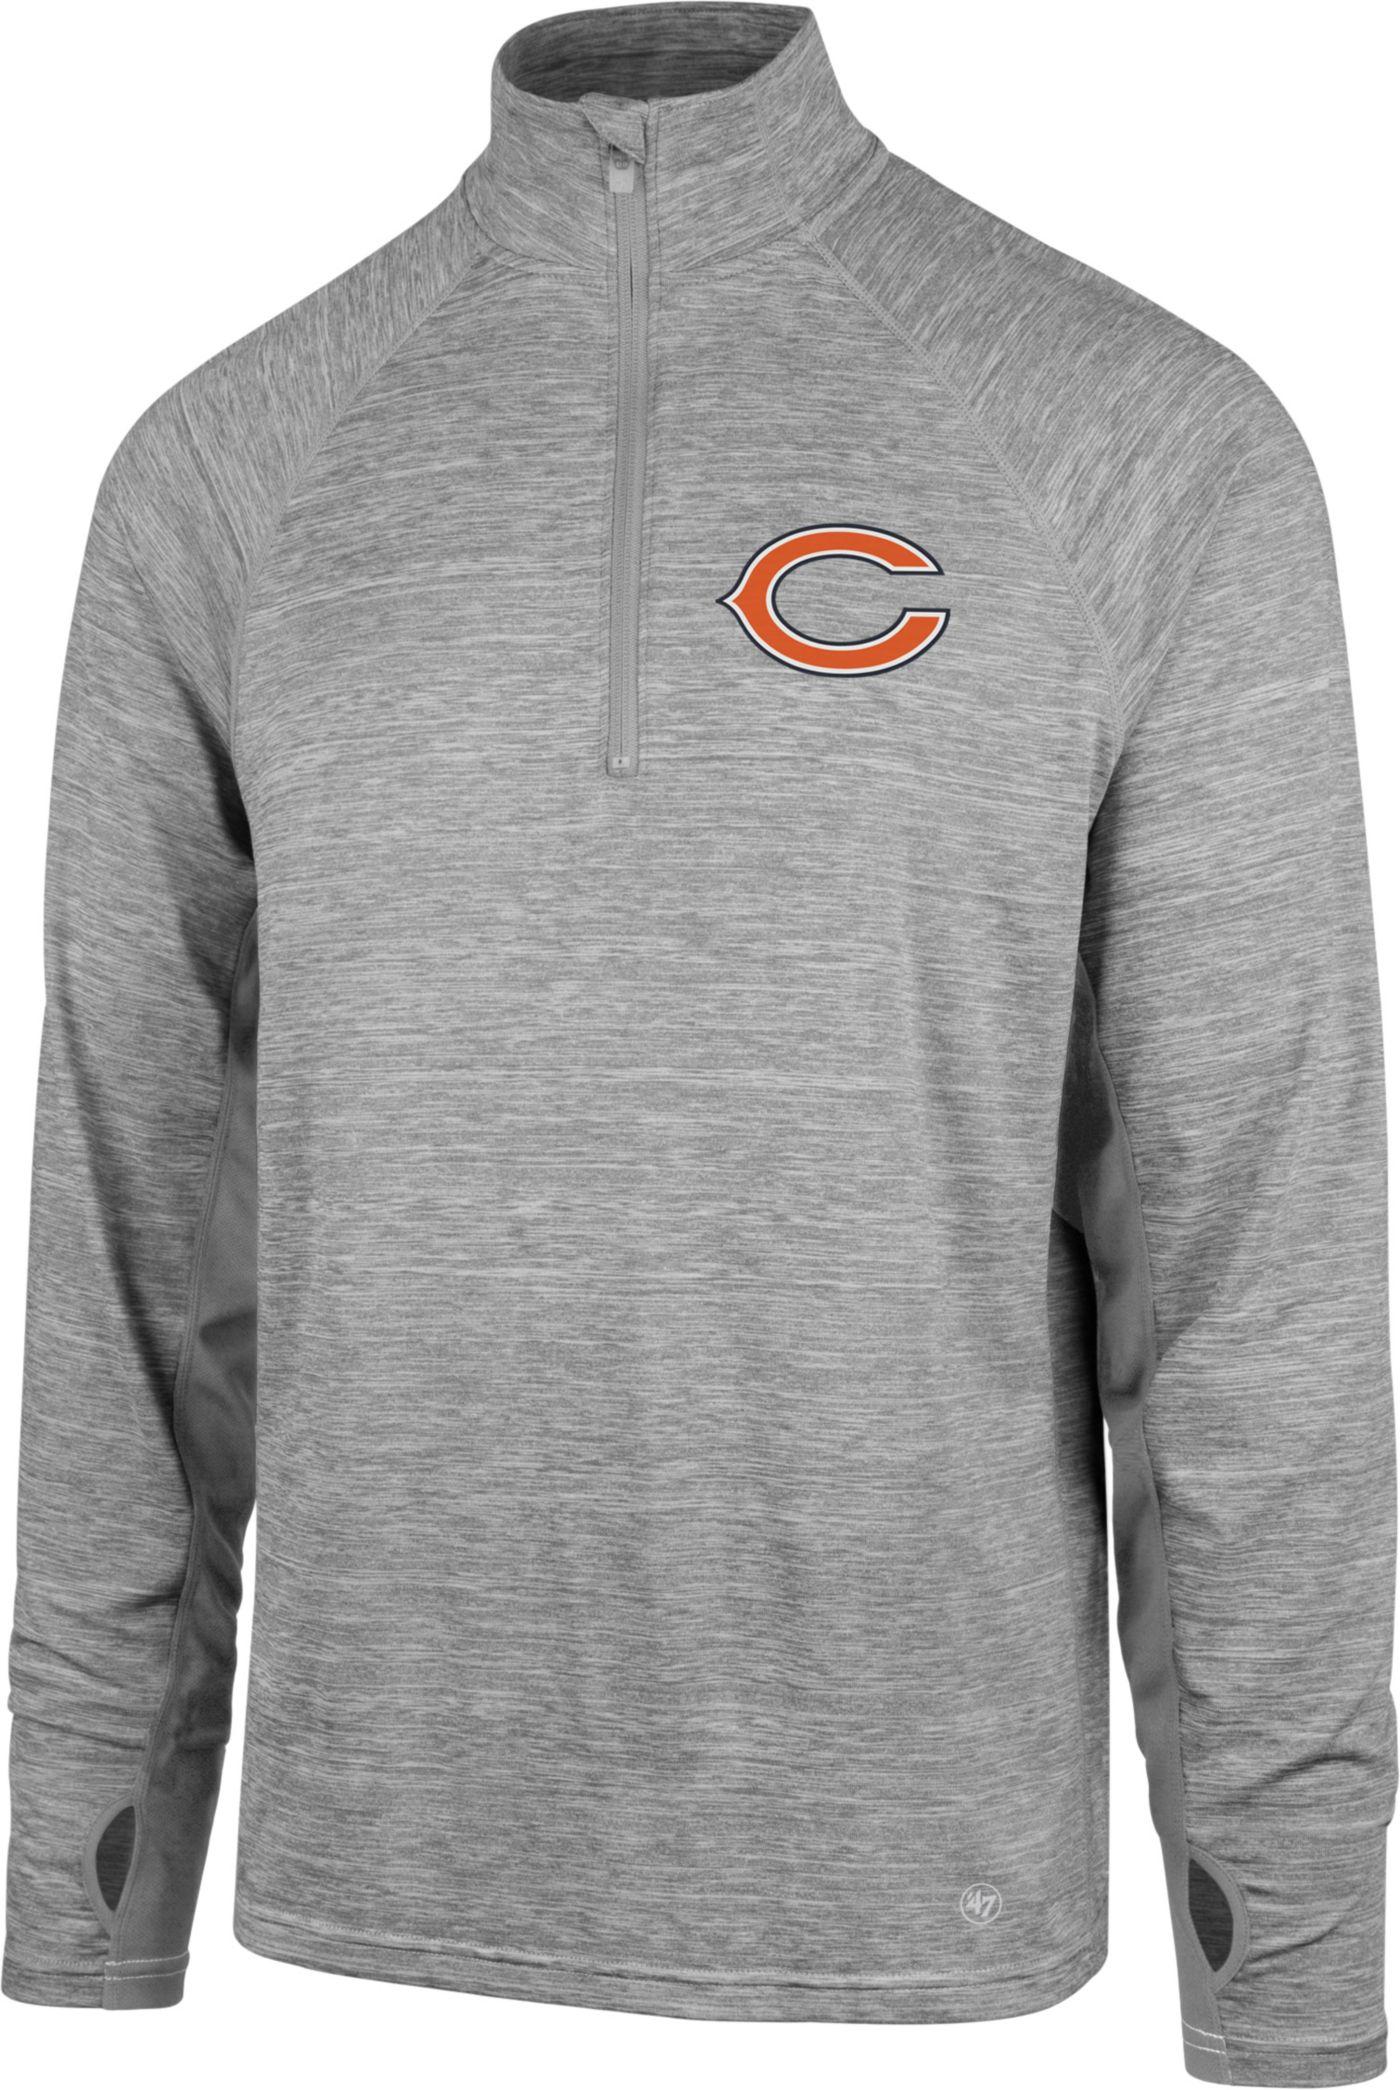 '47 Men's Chicago Bears Forward Grey Quarter-Zip Pullover